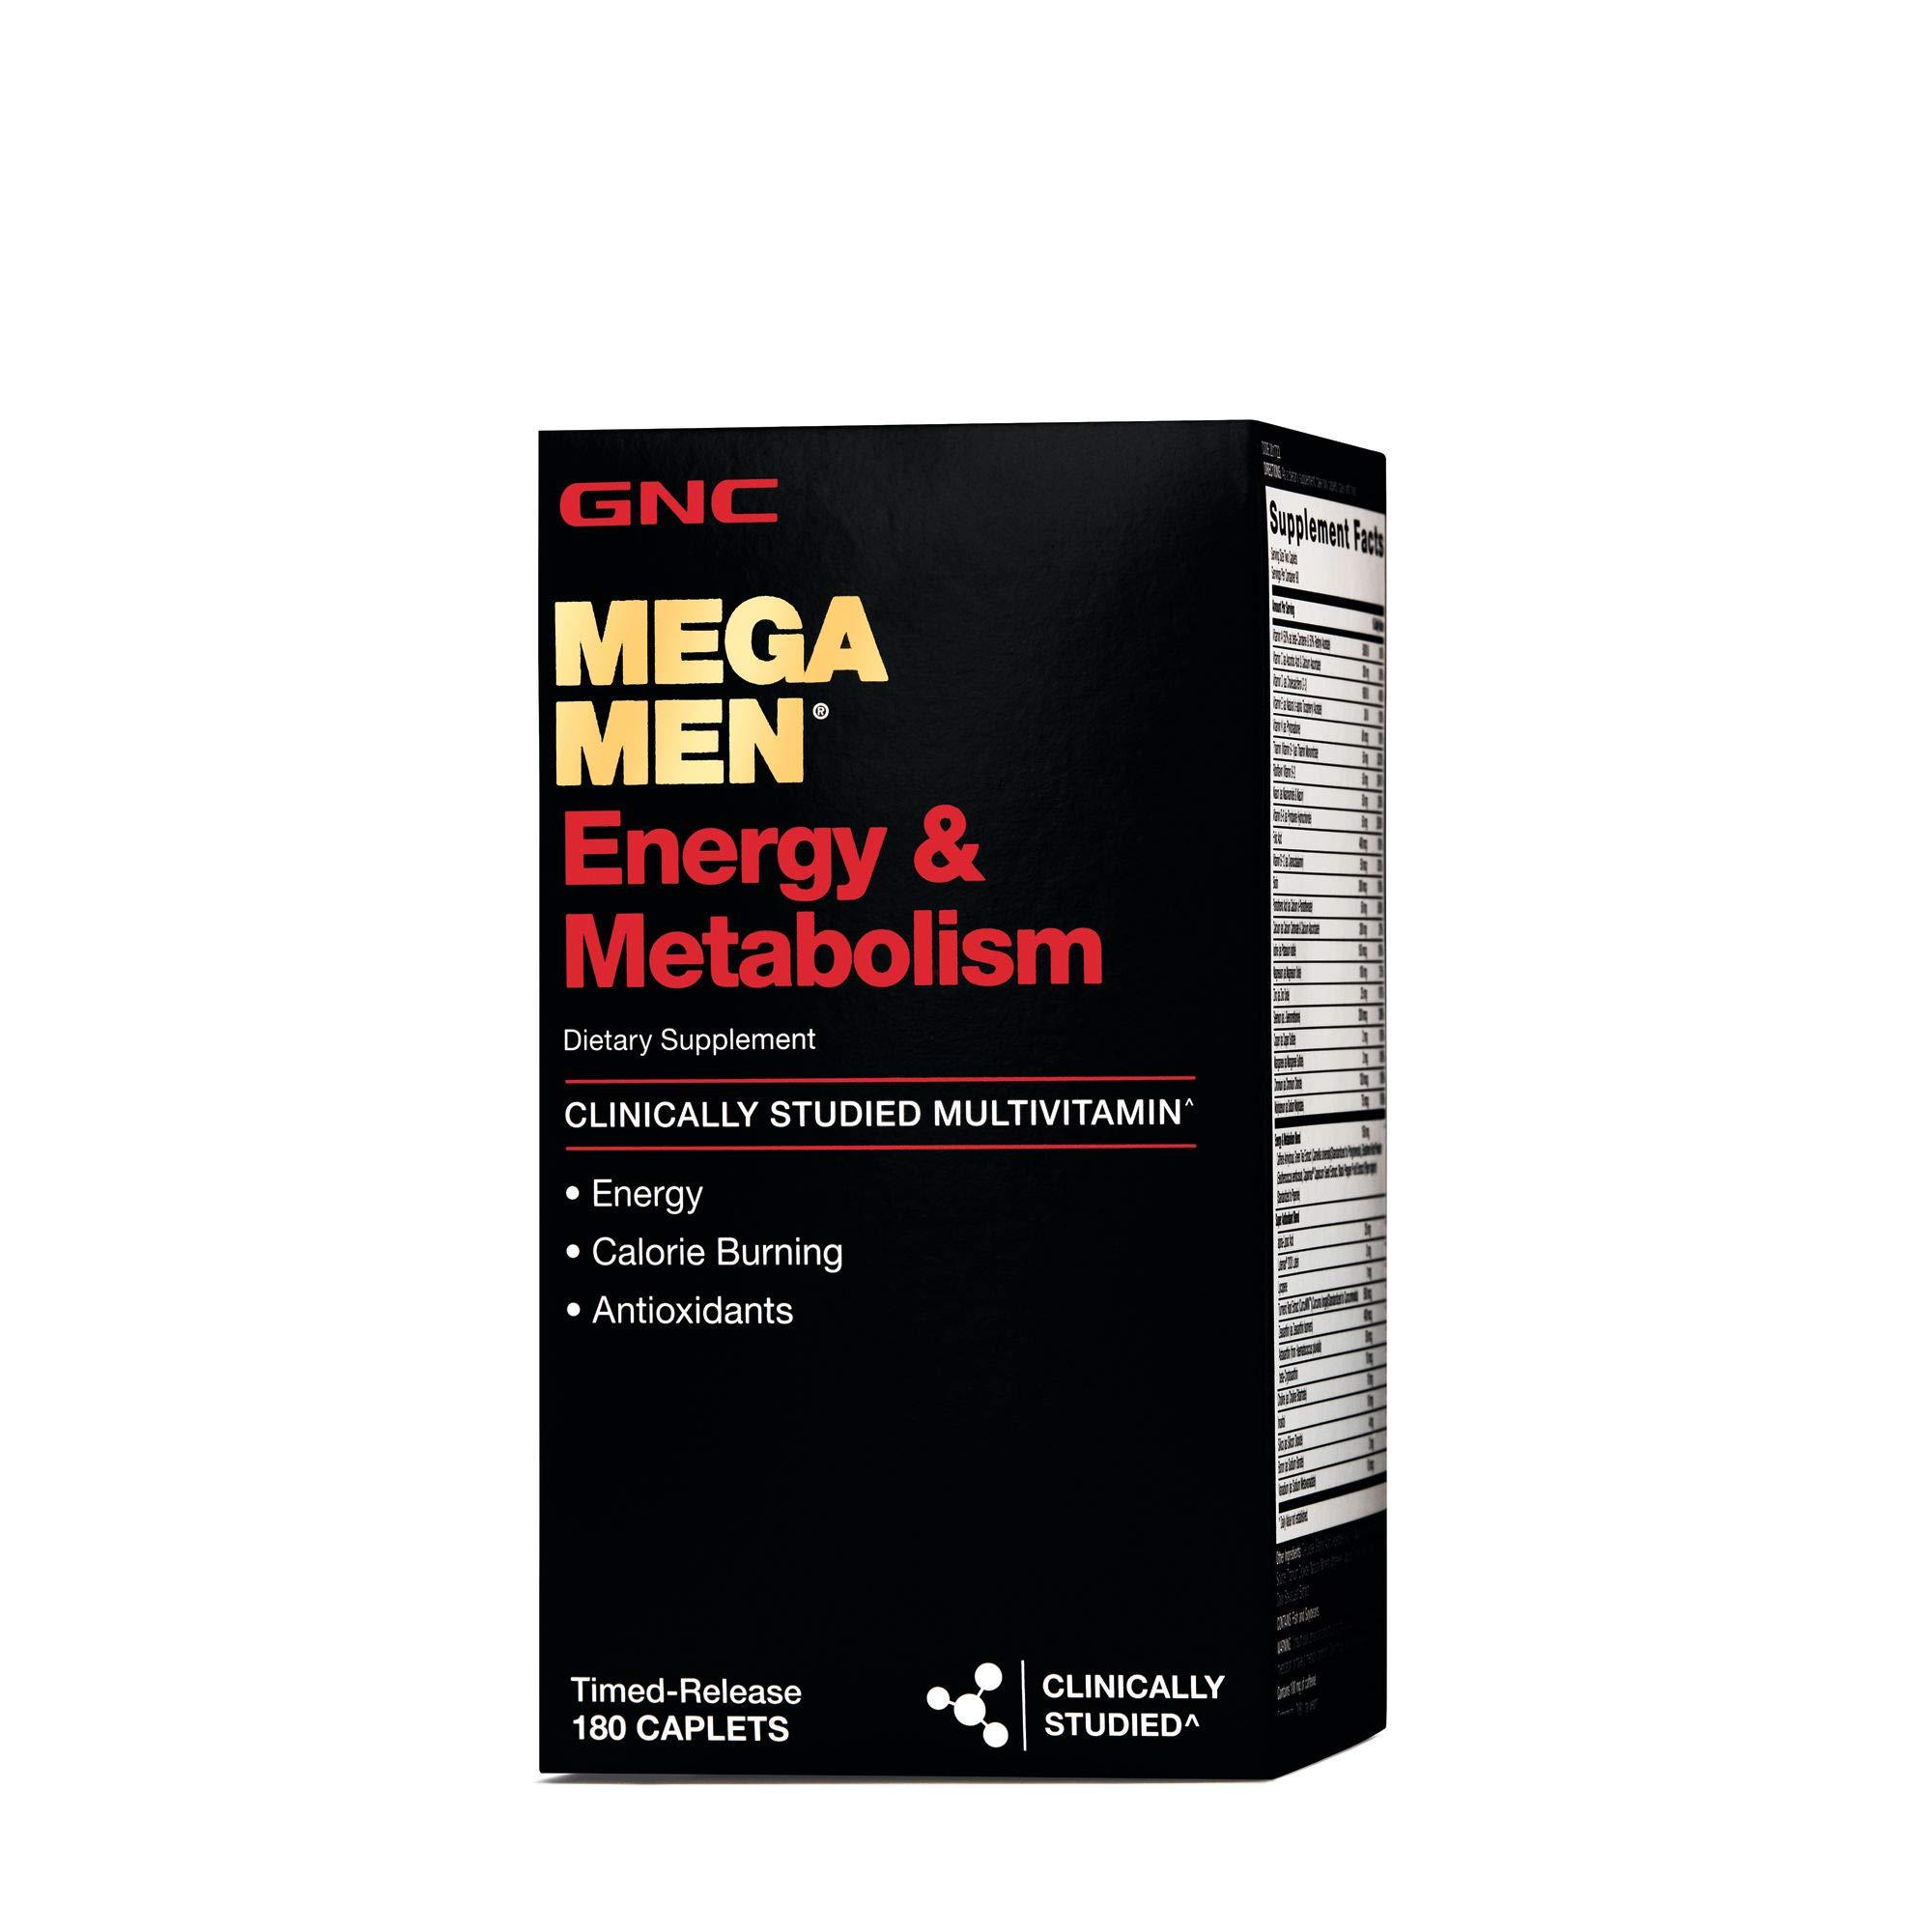 GNC Mega Men Energy Metabolism - 180 Caplets